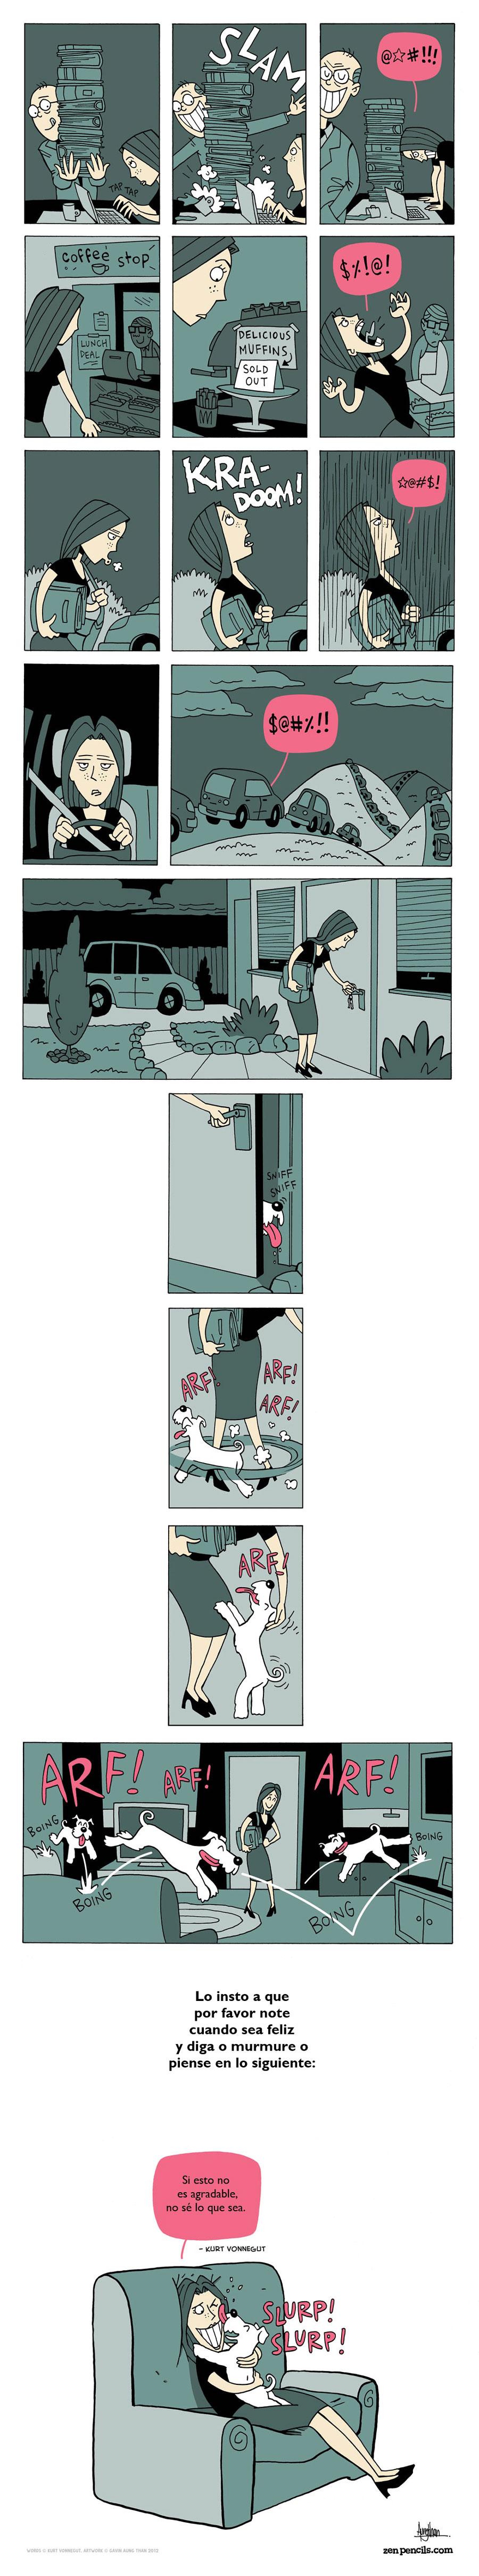 2010-01-17-27-Vonnegut-SPANISH.jpg